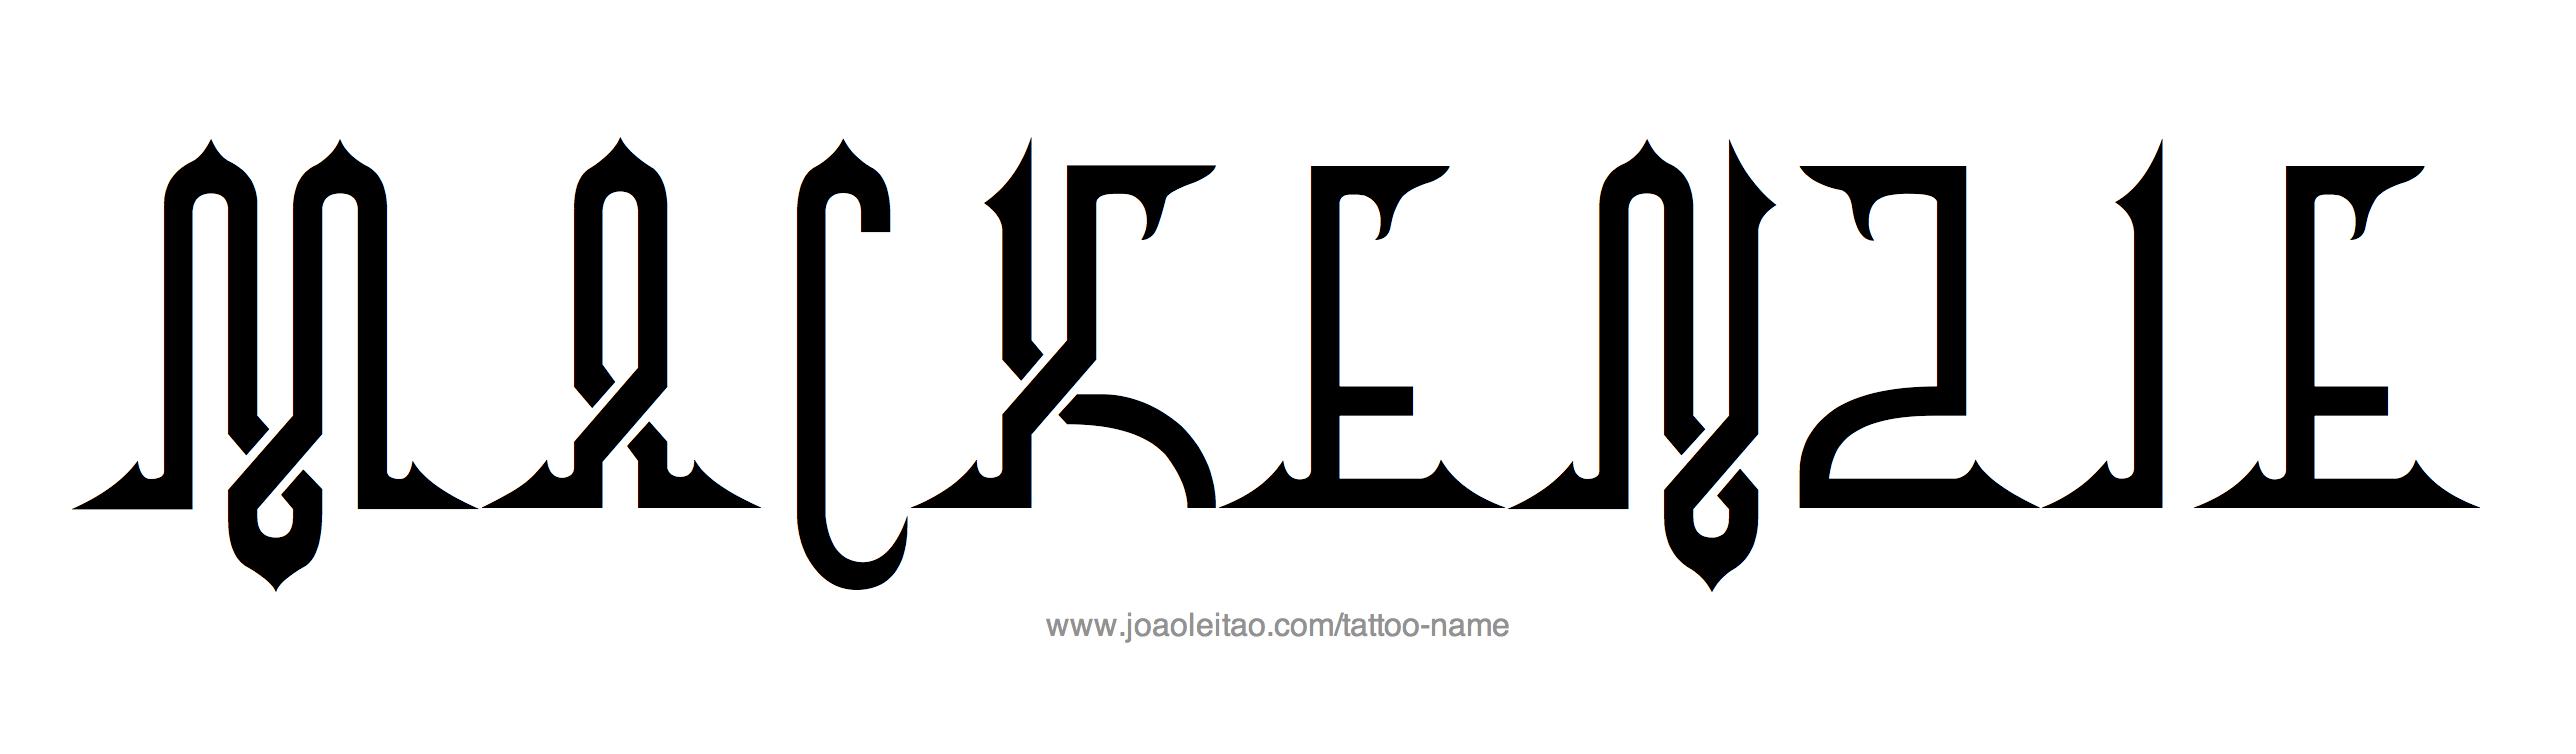 Tattoo Design Name Mackenzie